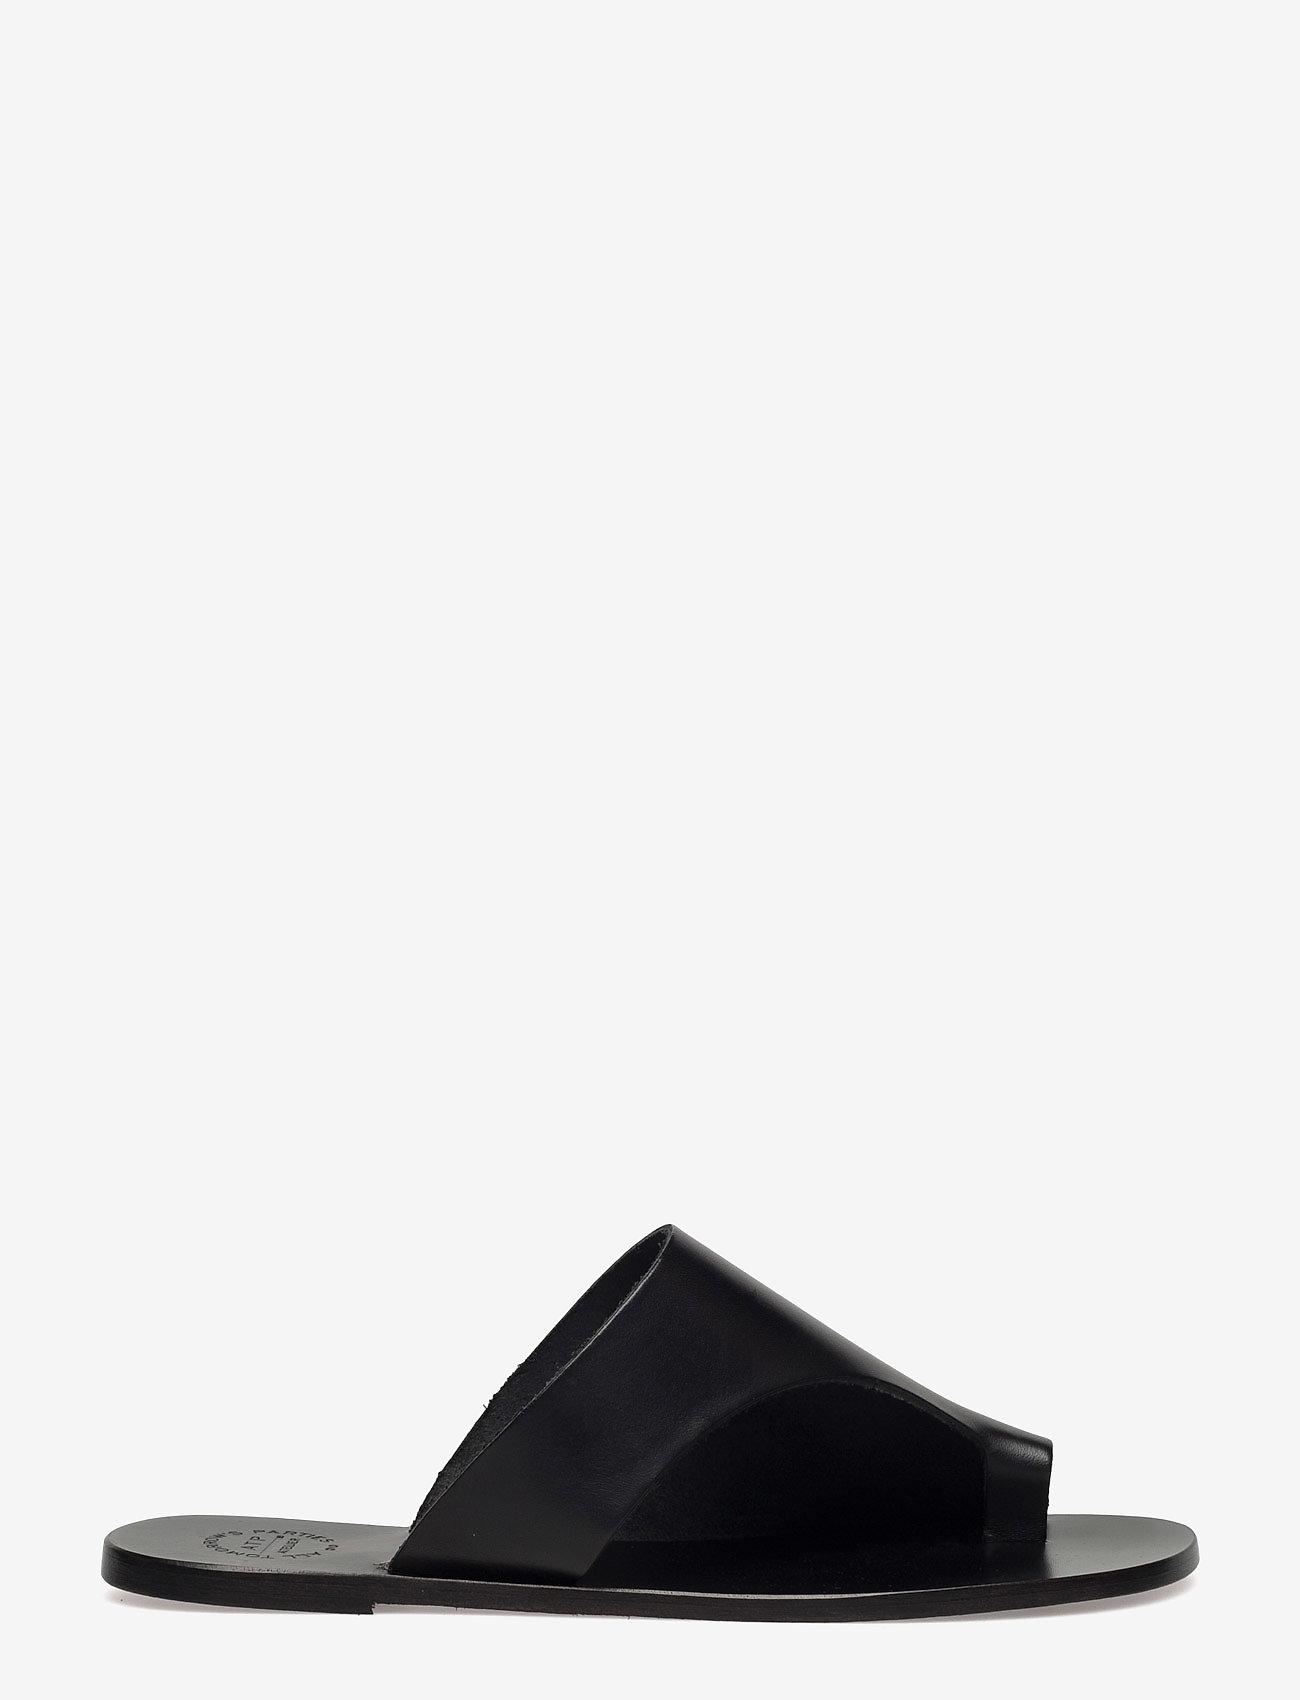 ATP Atelier - Rosa Black Vacchetta - flat sandals - black - 1